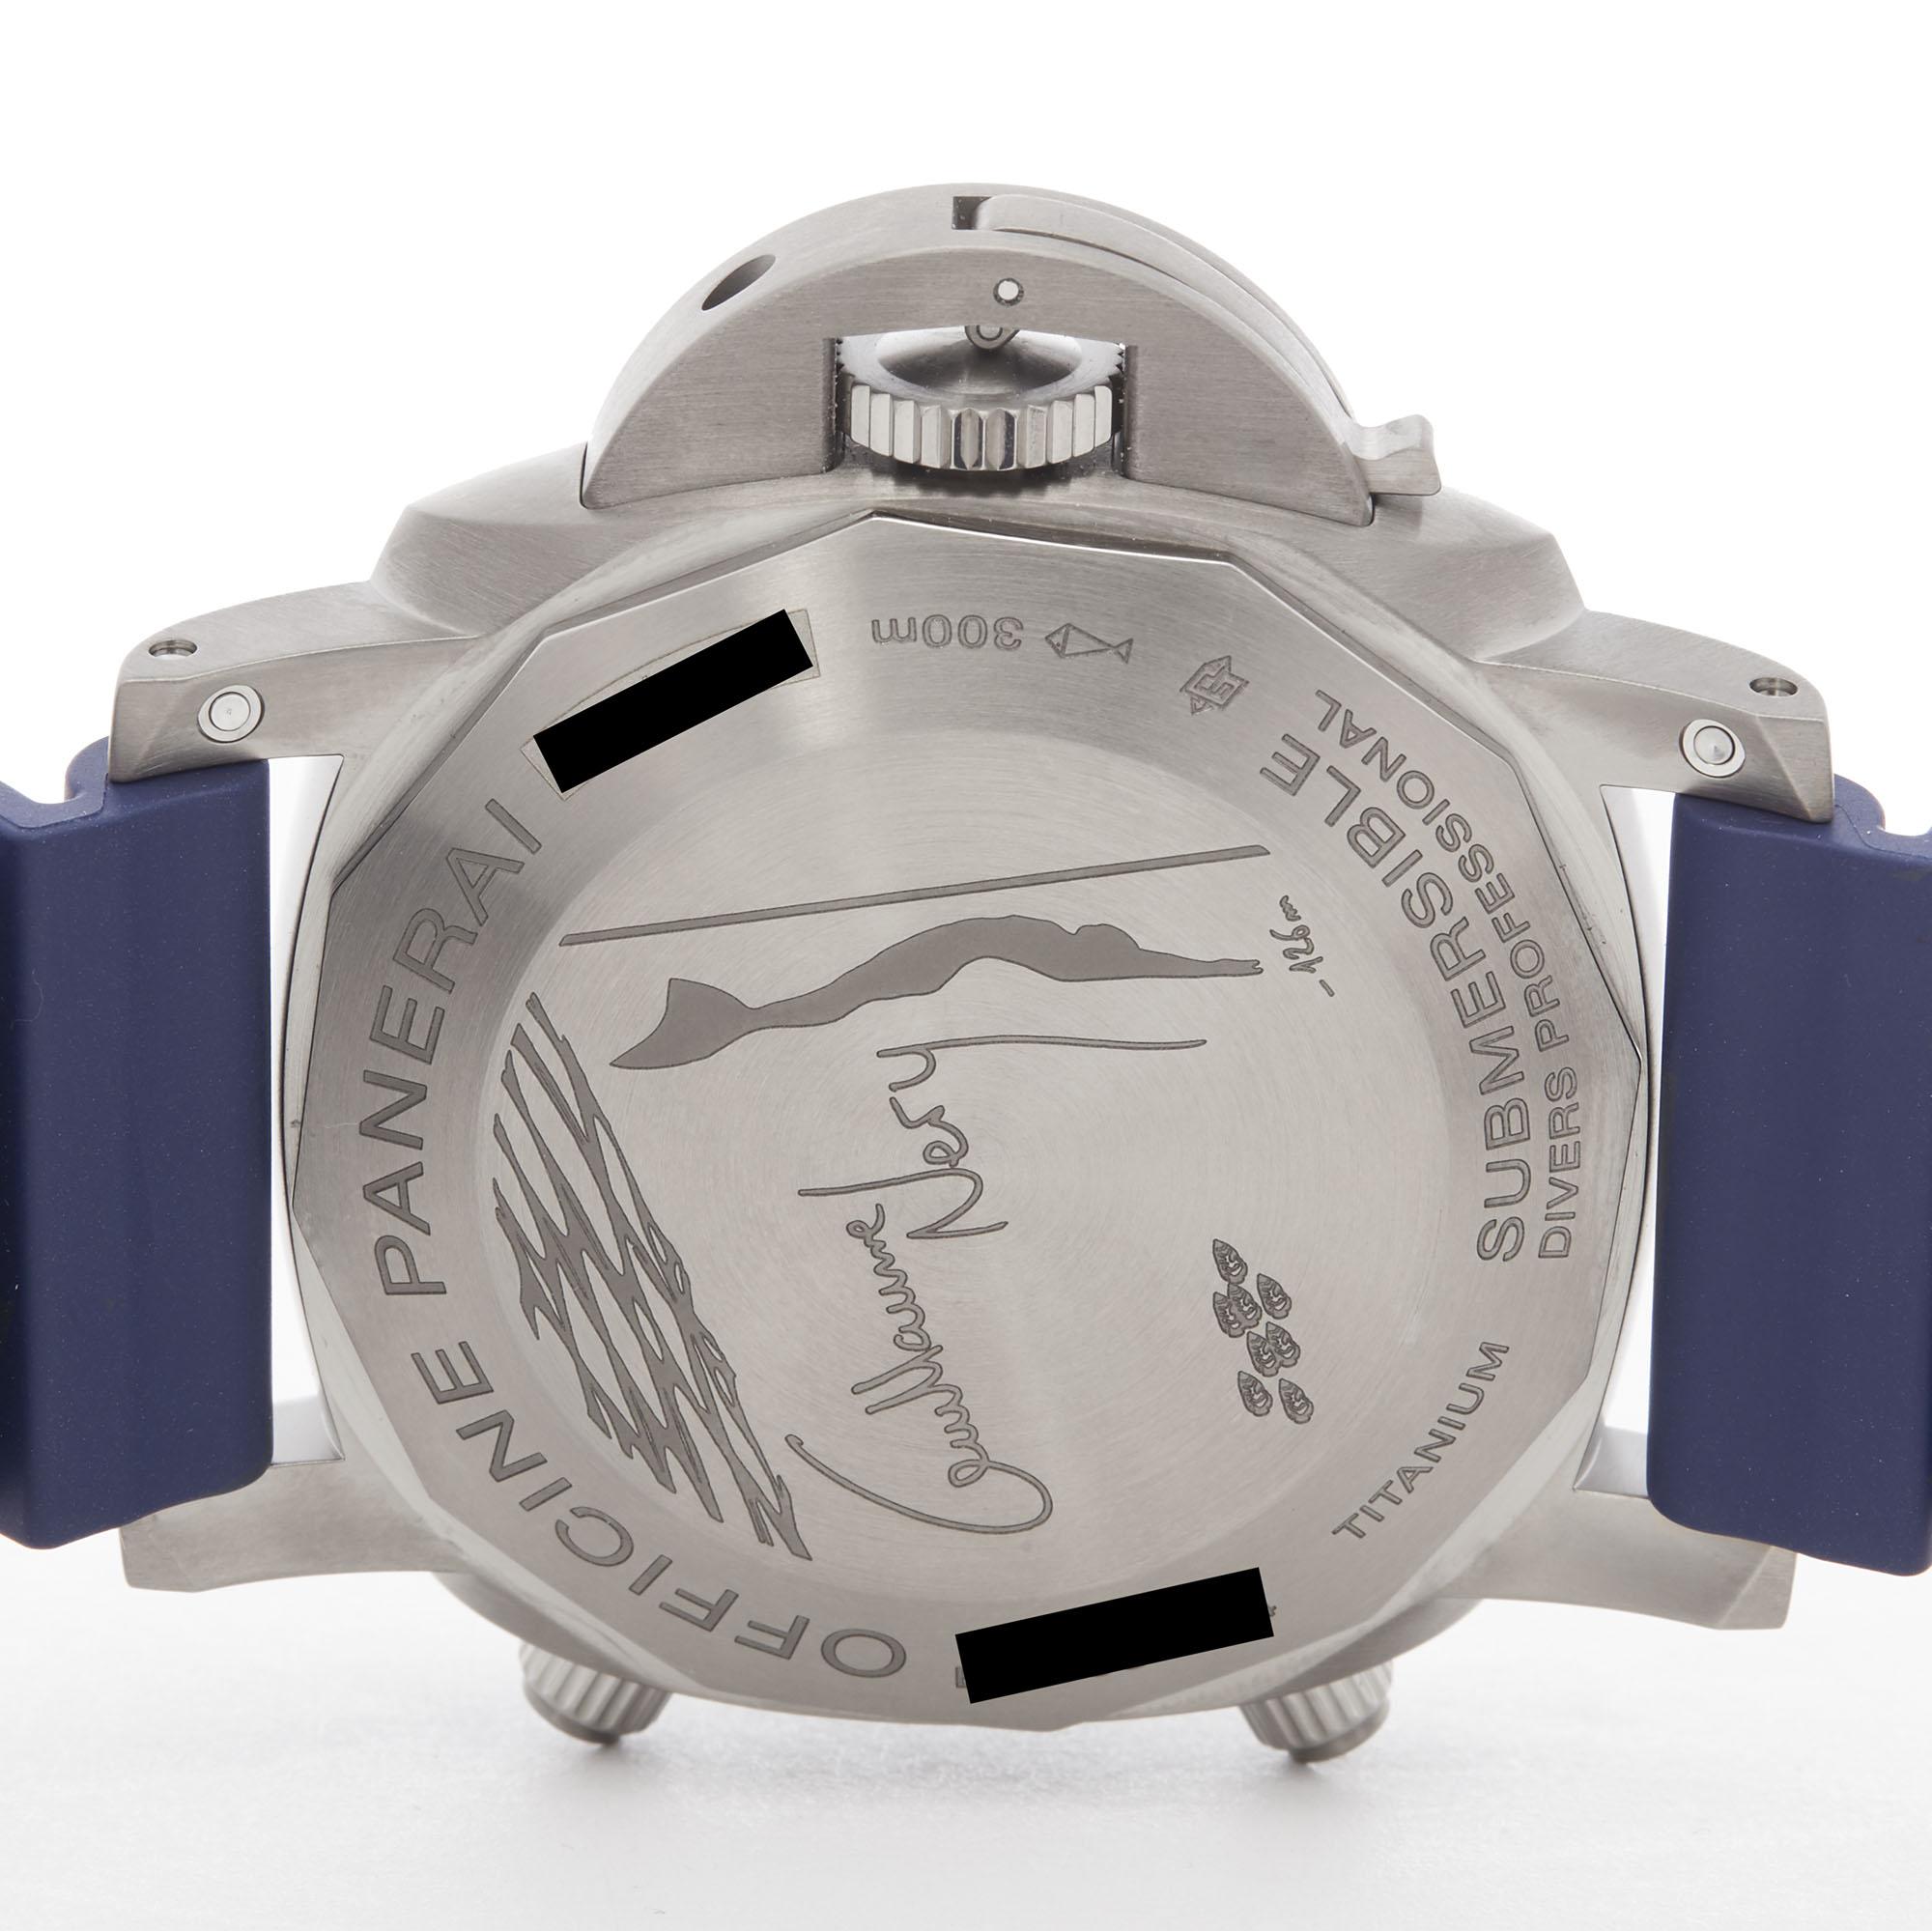 Panerai Luminor Submersible PAM00982 Men Stainless Steel Chronograph Watch - Image 4 of 8